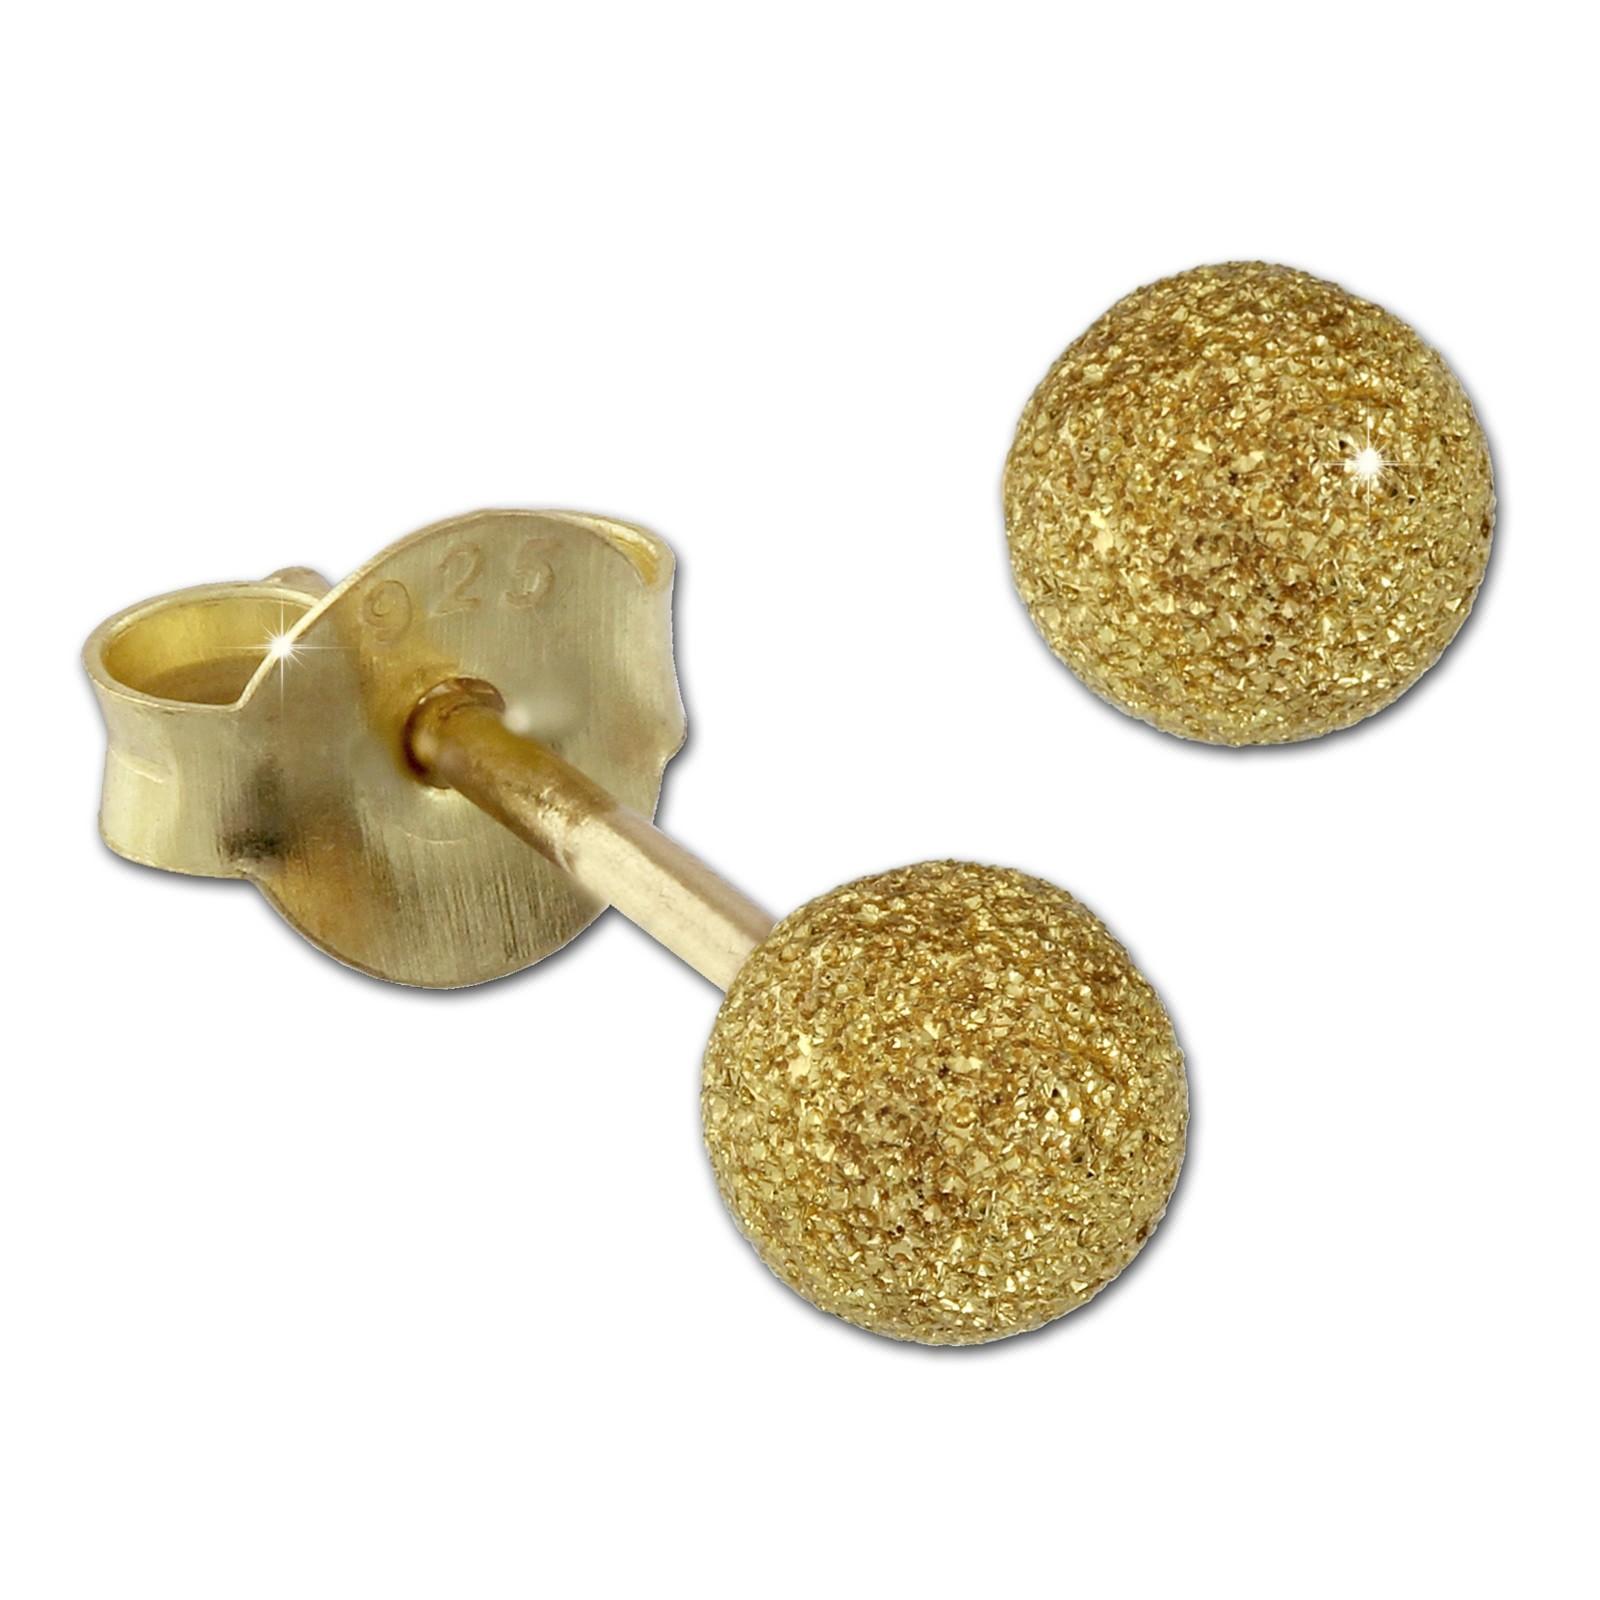 SilberDream Ohrstecker vergoldet Kugel 3mm diamantiert 925er Ohrring SDO9513Y